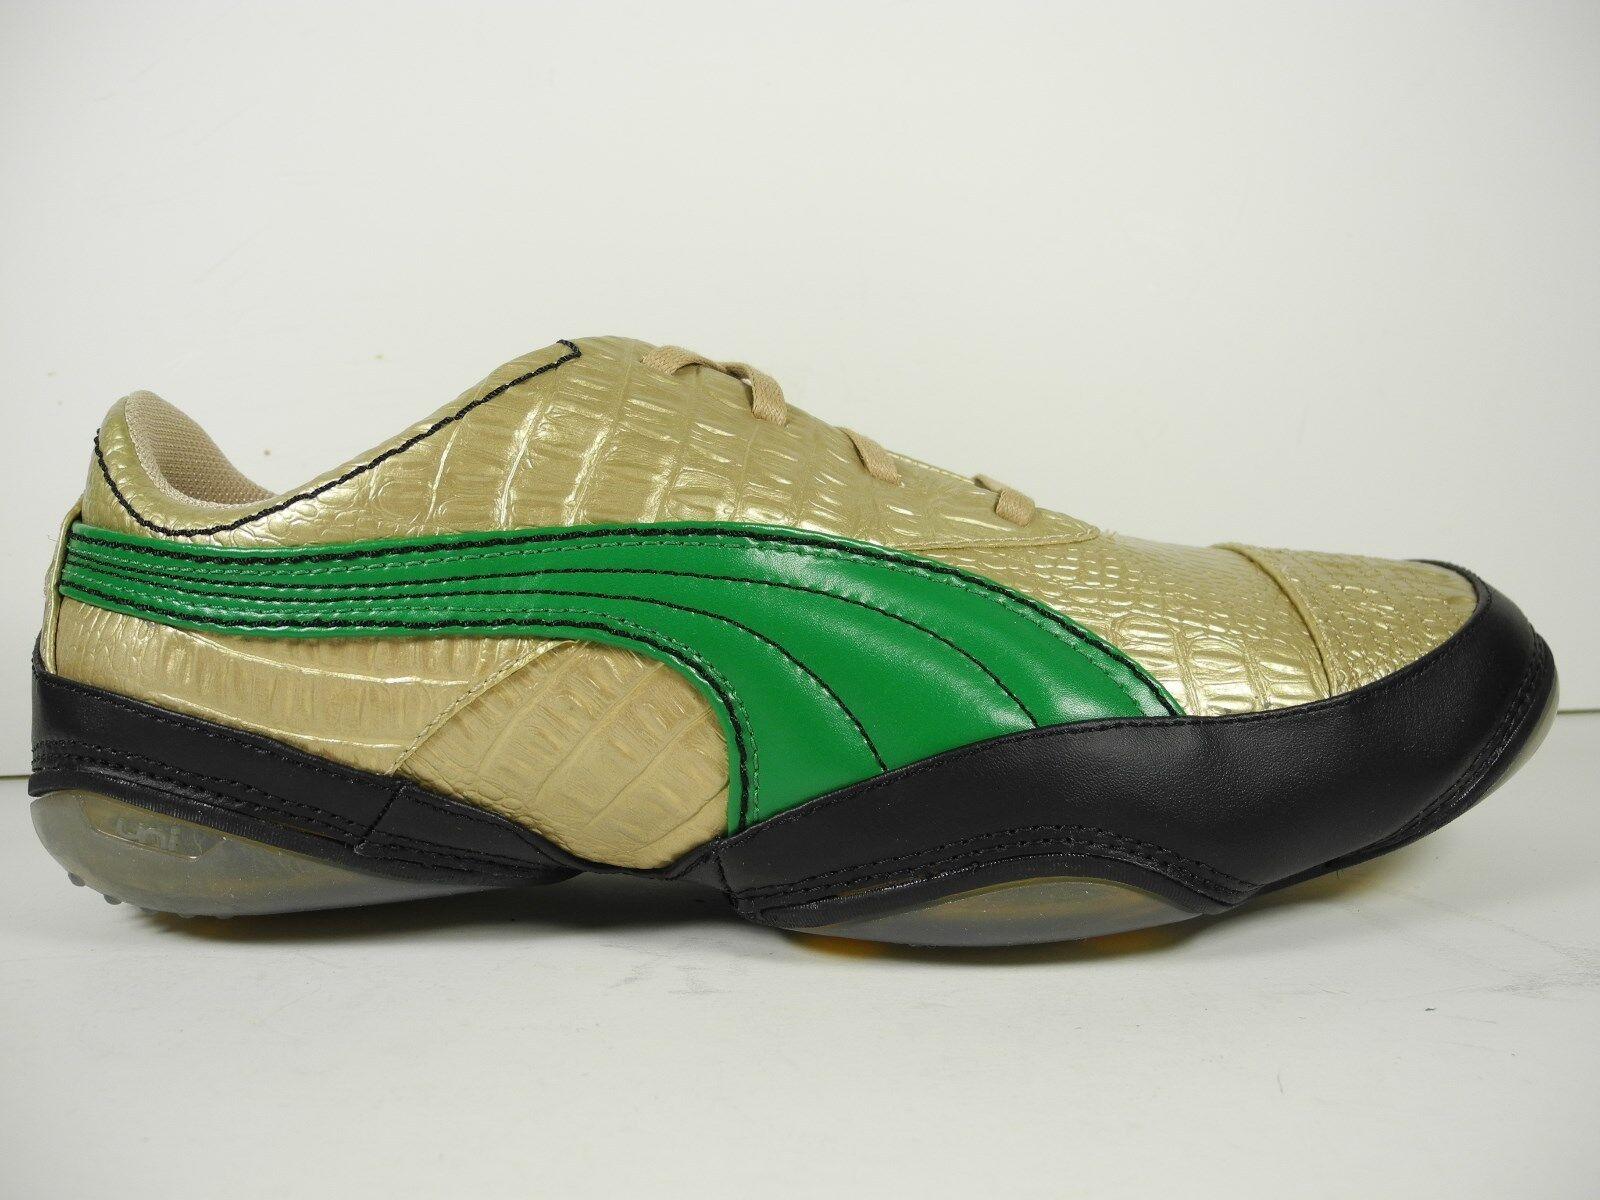 2d8d38d8c19c6 NEW Puma USAN METALLIC CROC CROC CROC Men s Shoes Size US 11.5 62825c